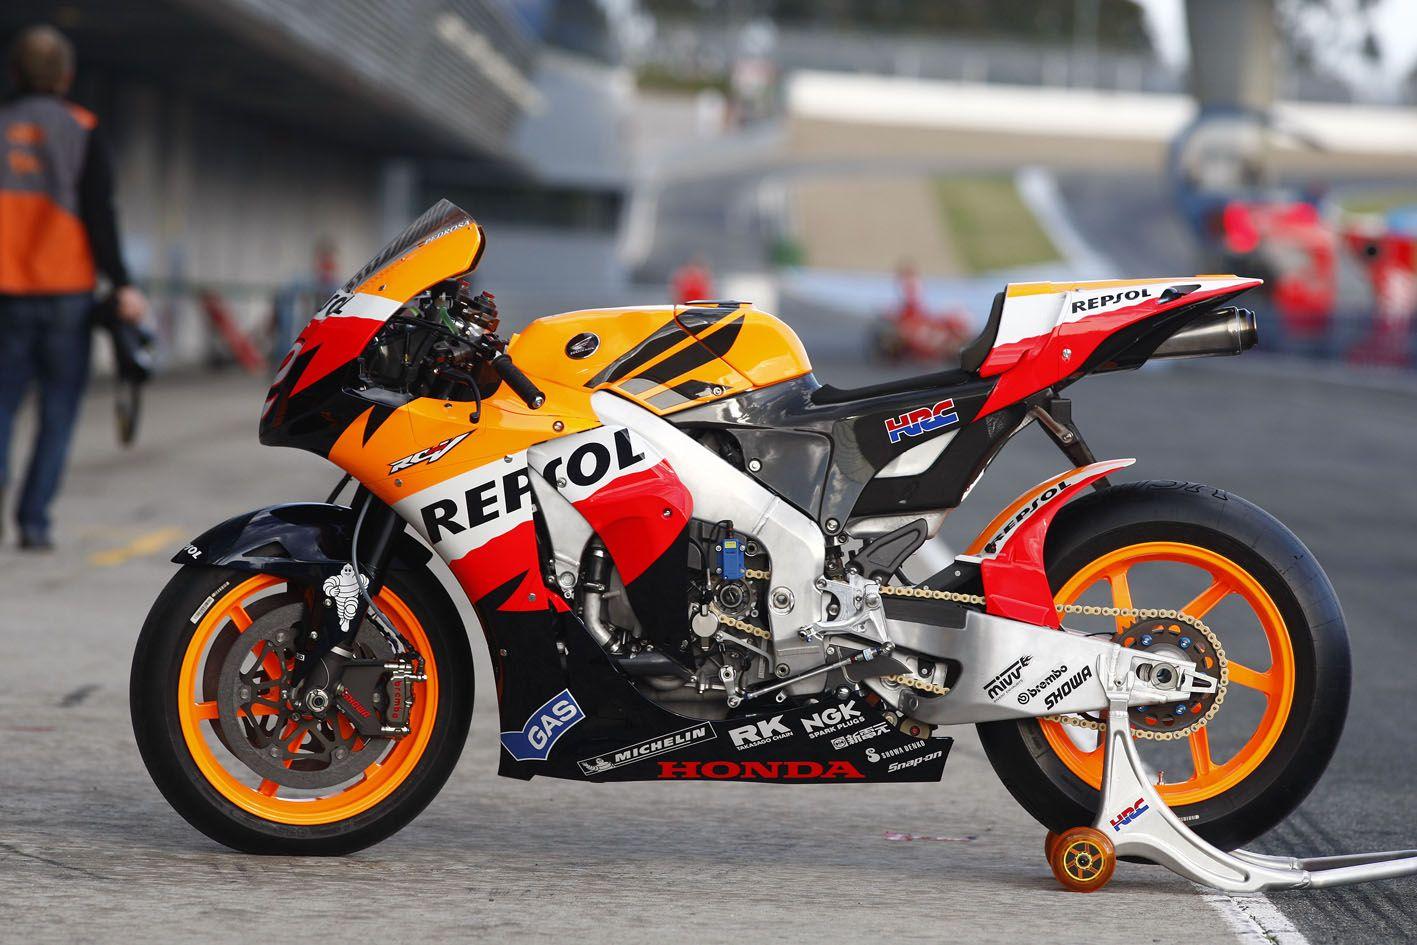 Honda Racing Moto Gp: Moto GP Honda Repsol